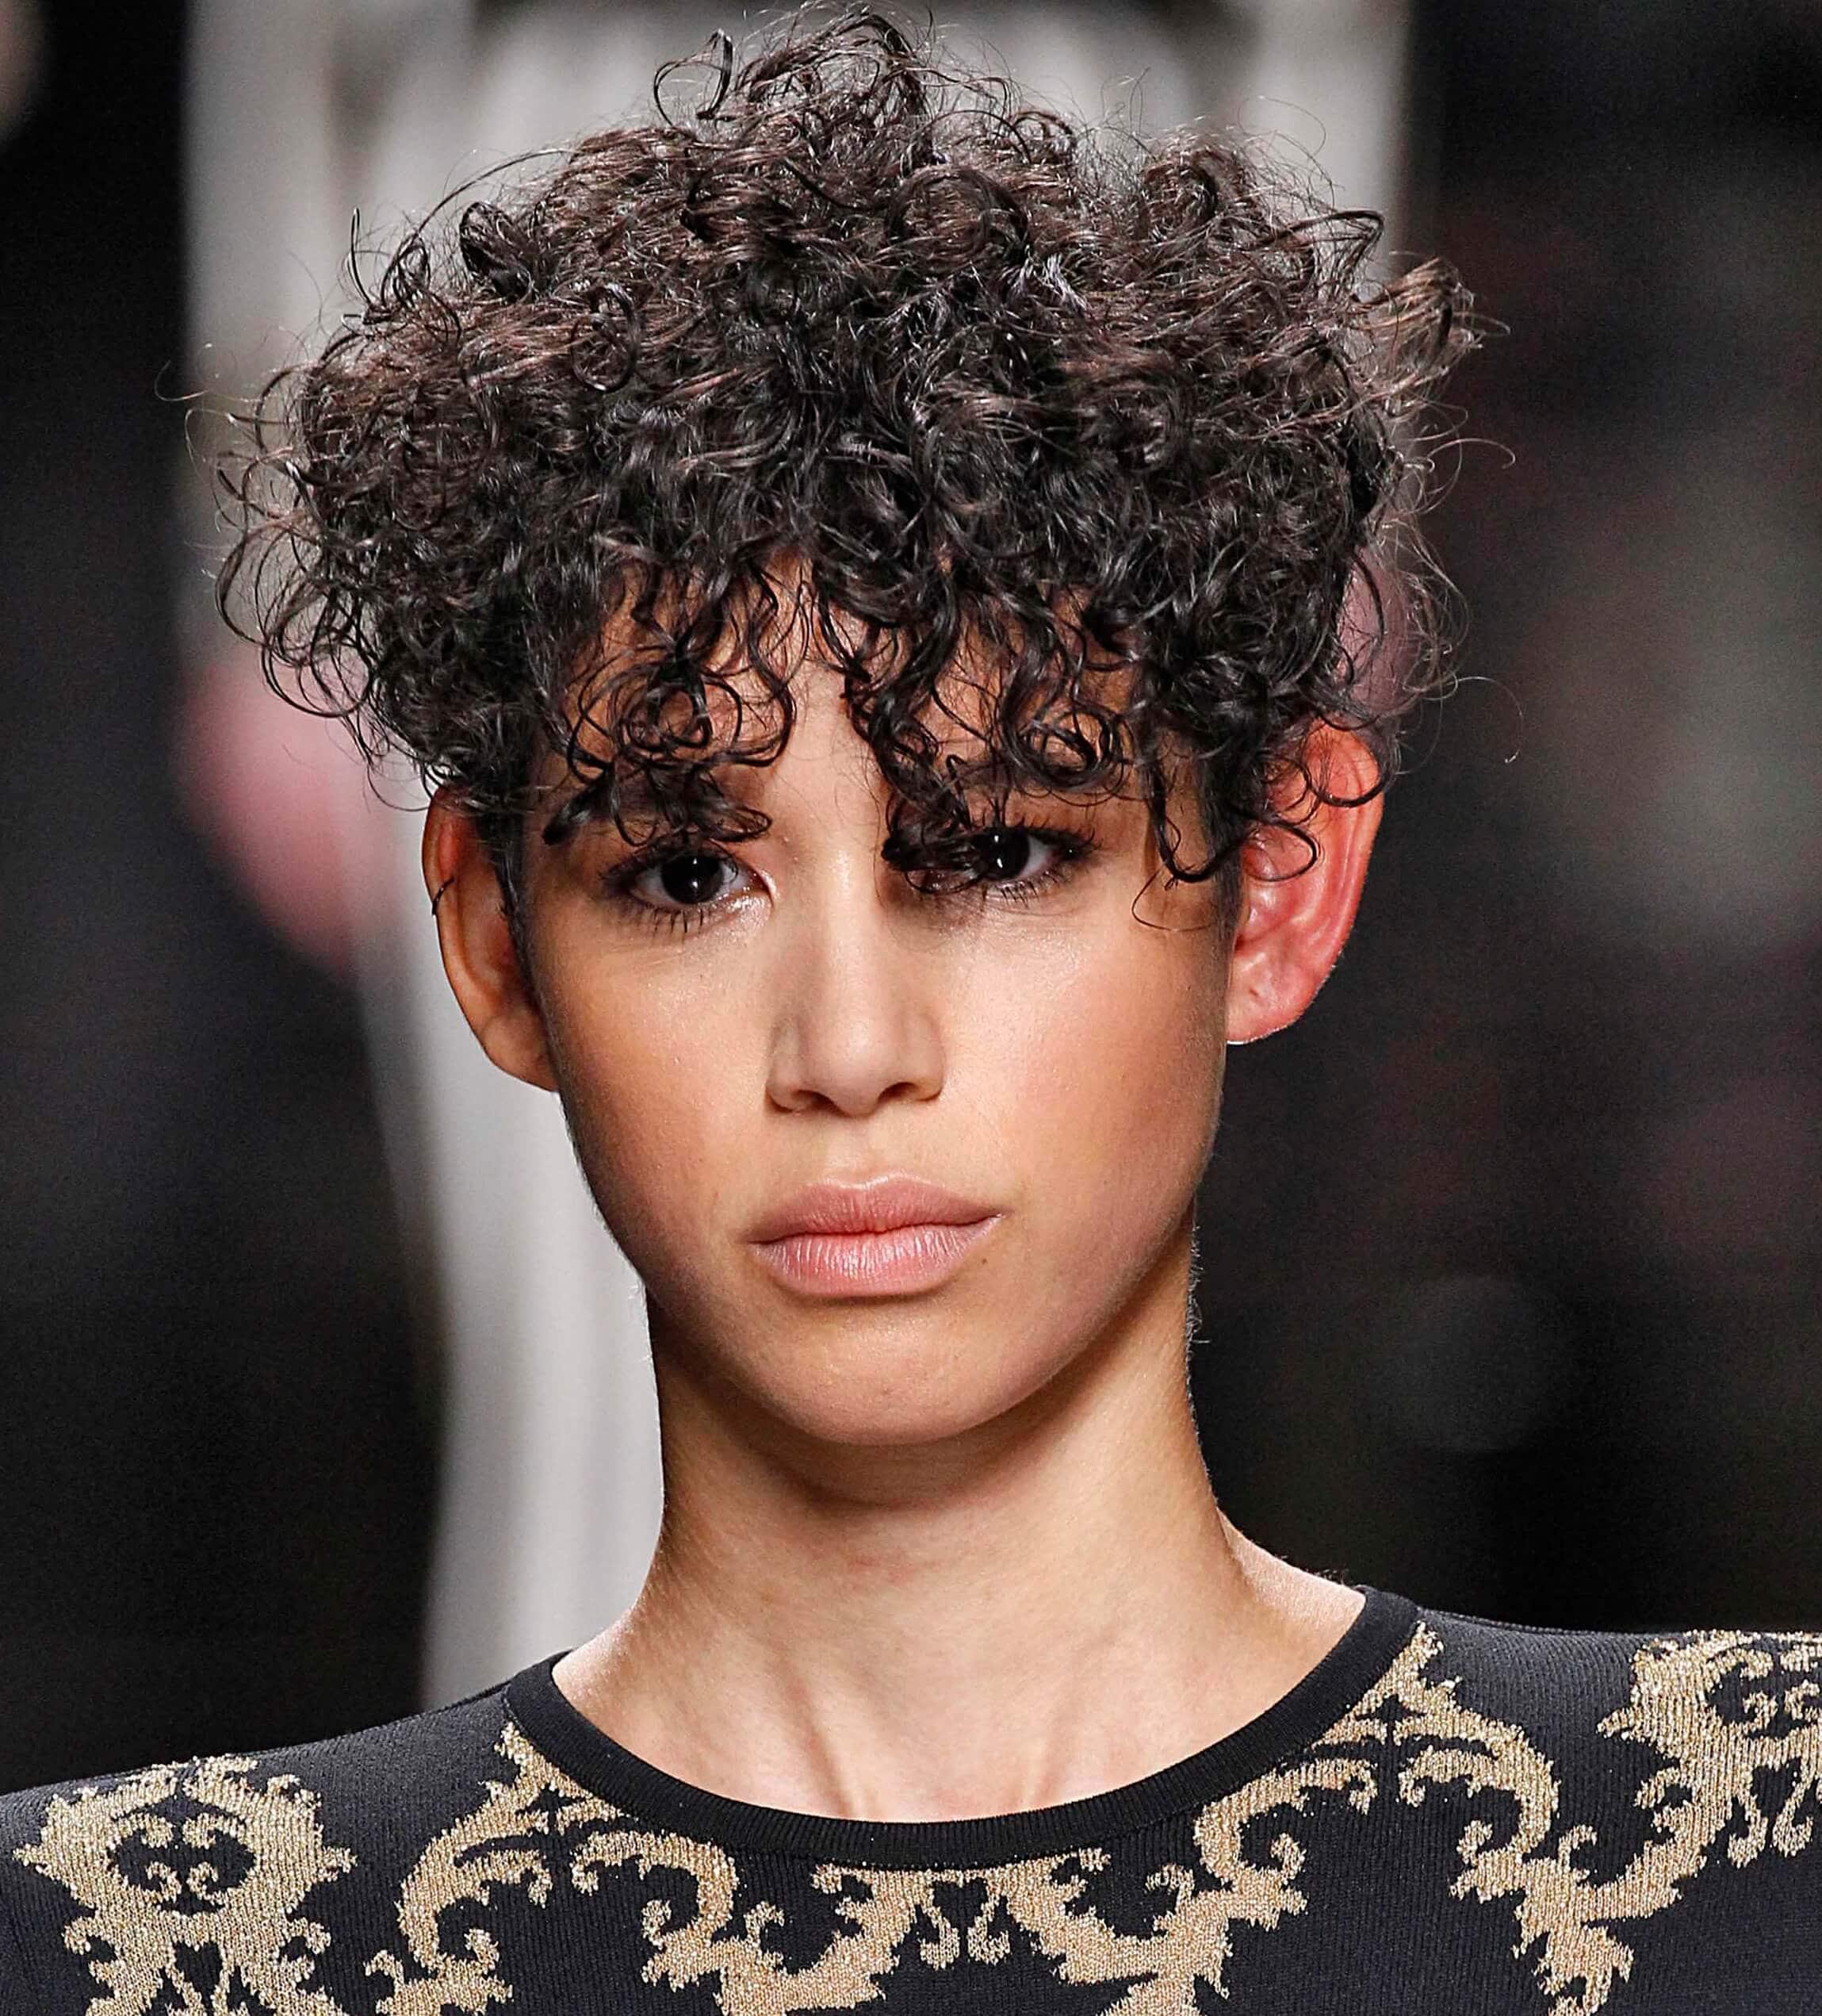 natural curly black hair in pixie cut